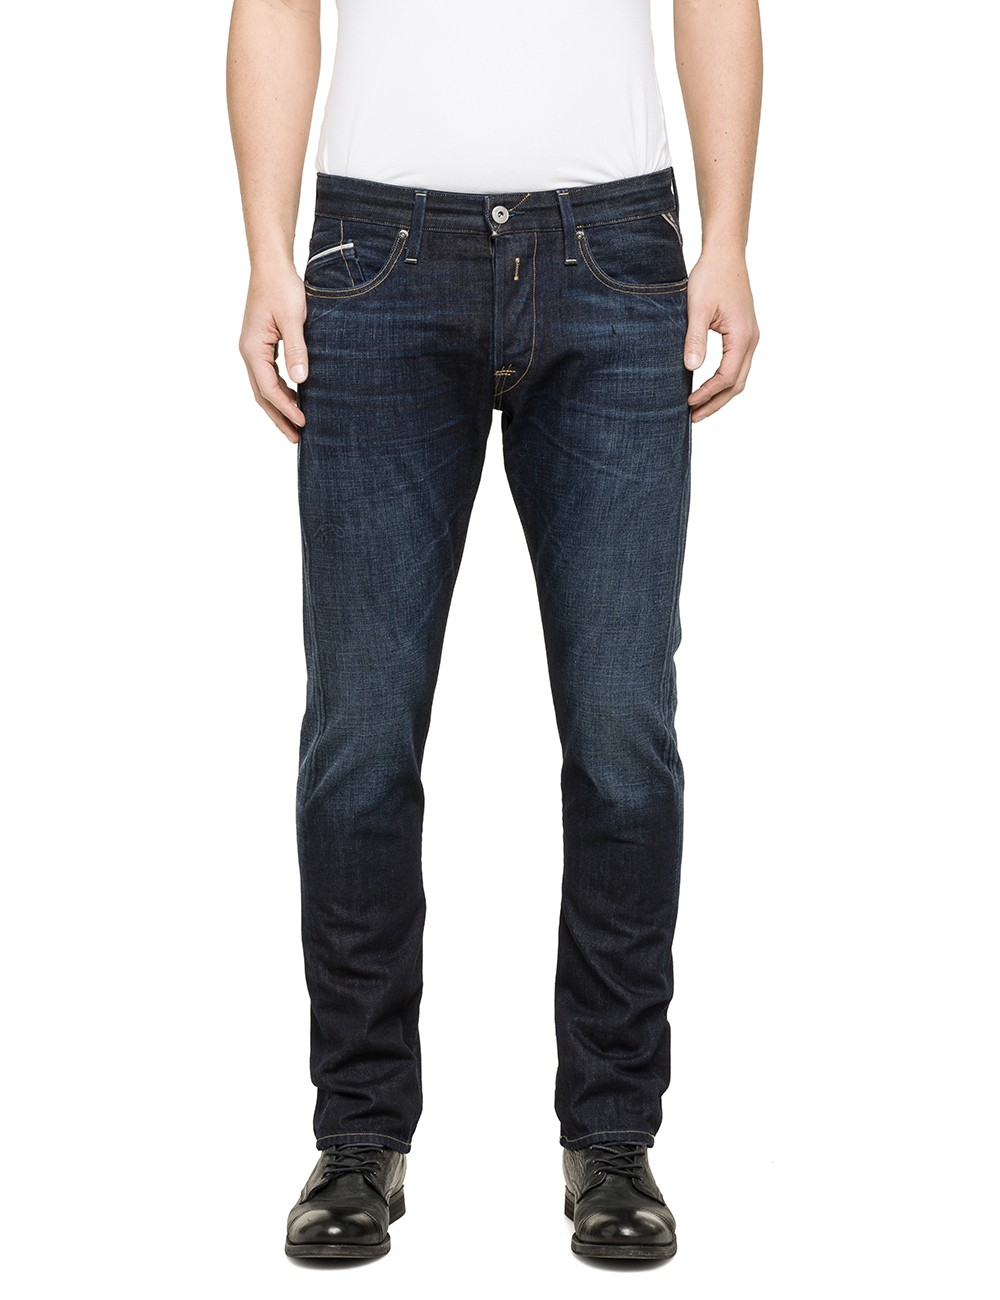 replay herren jeans waitom m983 606 602 regular fit slim. Black Bedroom Furniture Sets. Home Design Ideas